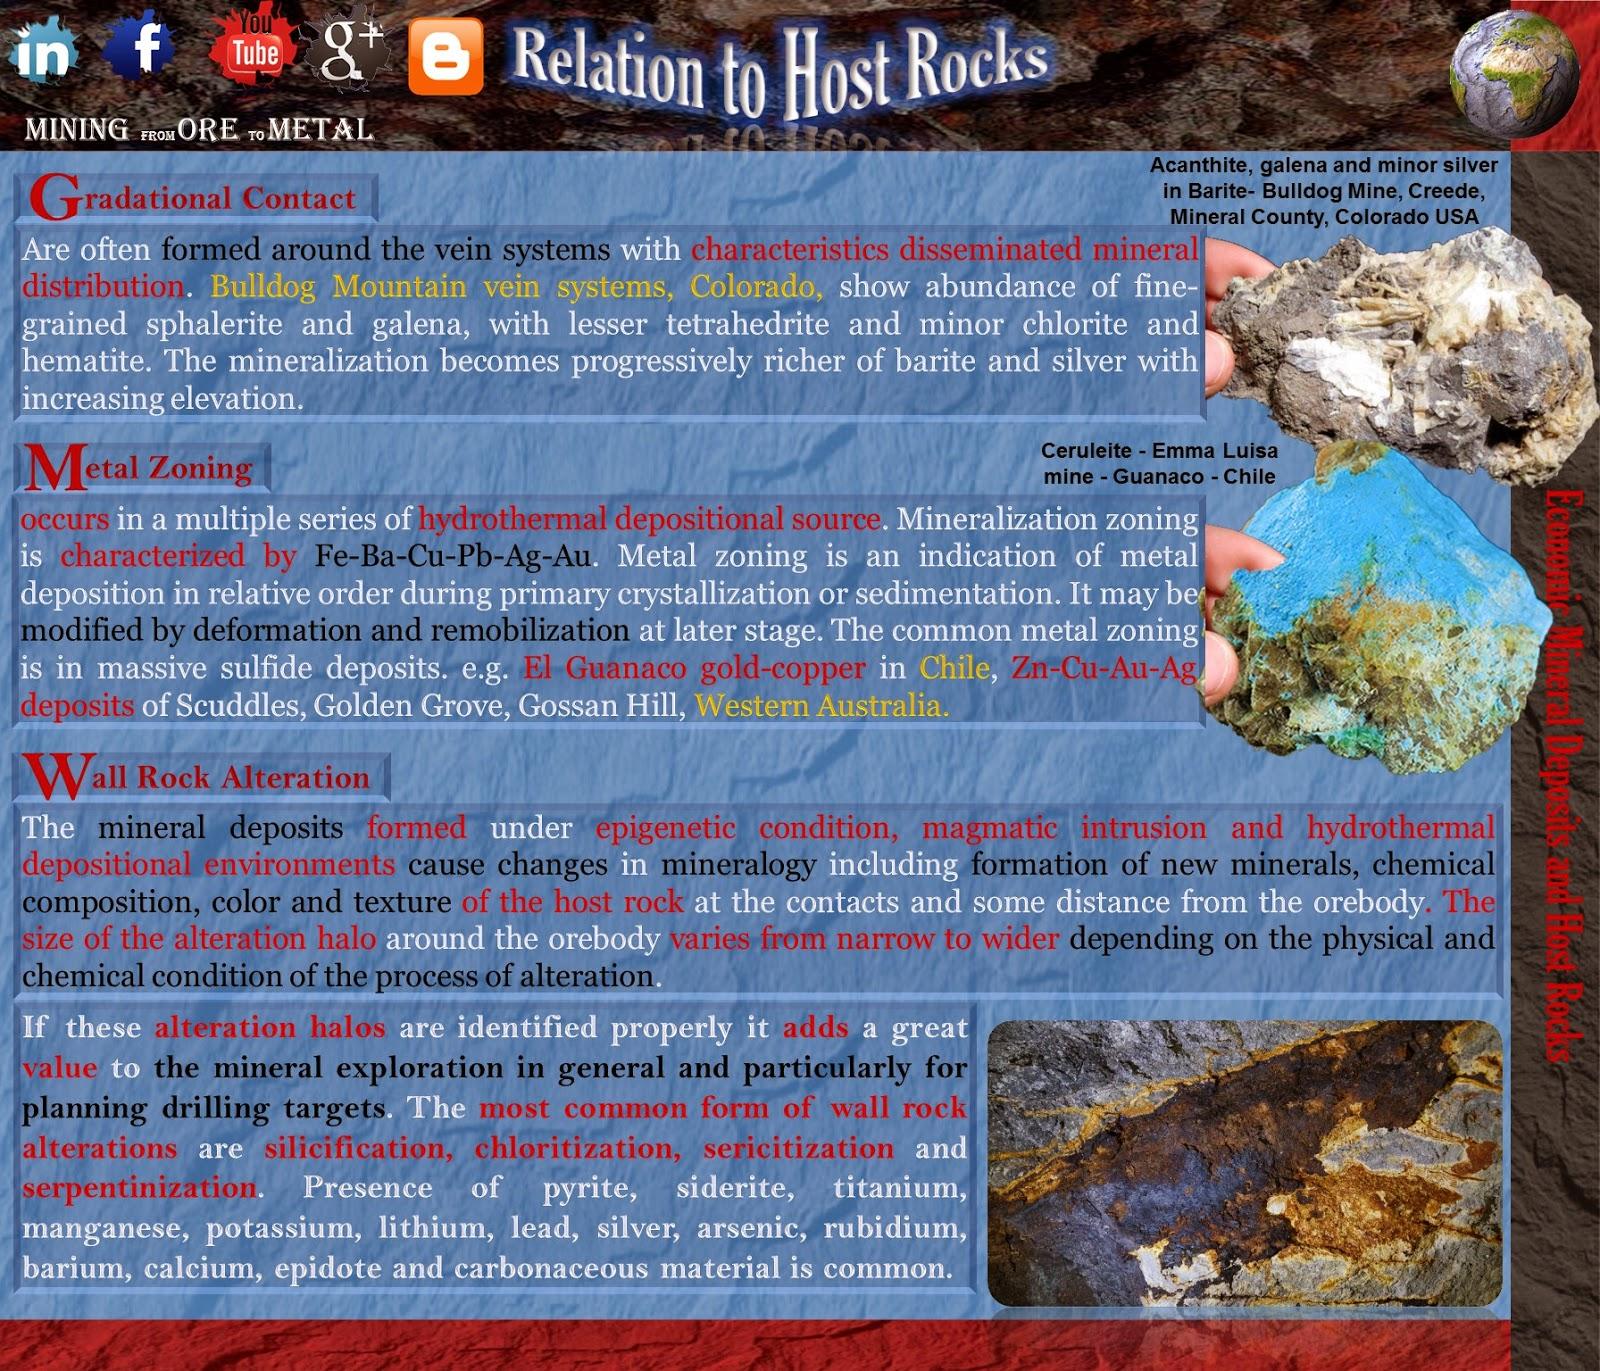 wallrock alteration